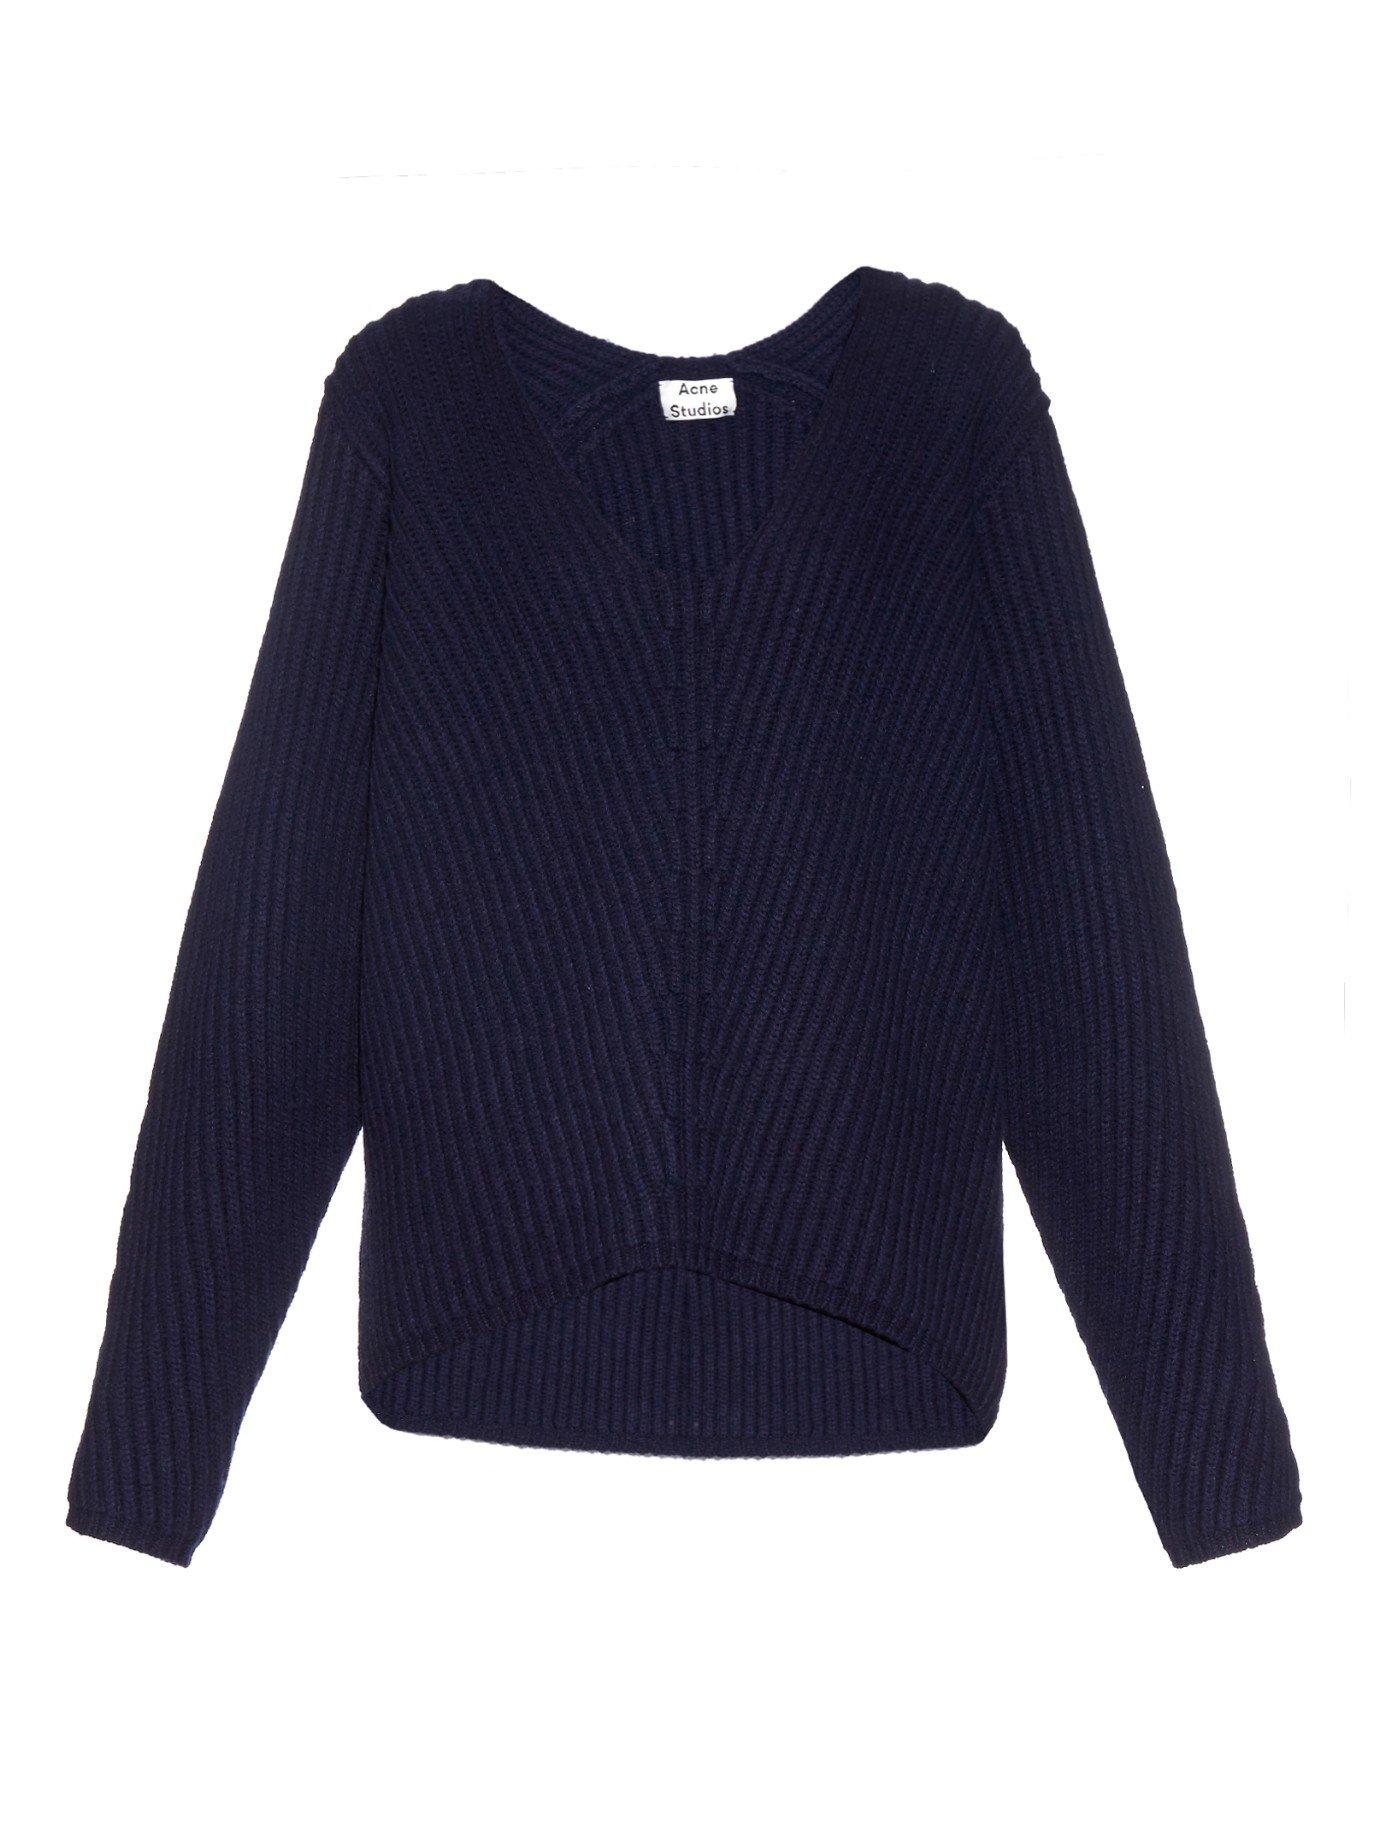 Acne studios Deborah Ribed-knit Wool Sweater in Blue | Lyst